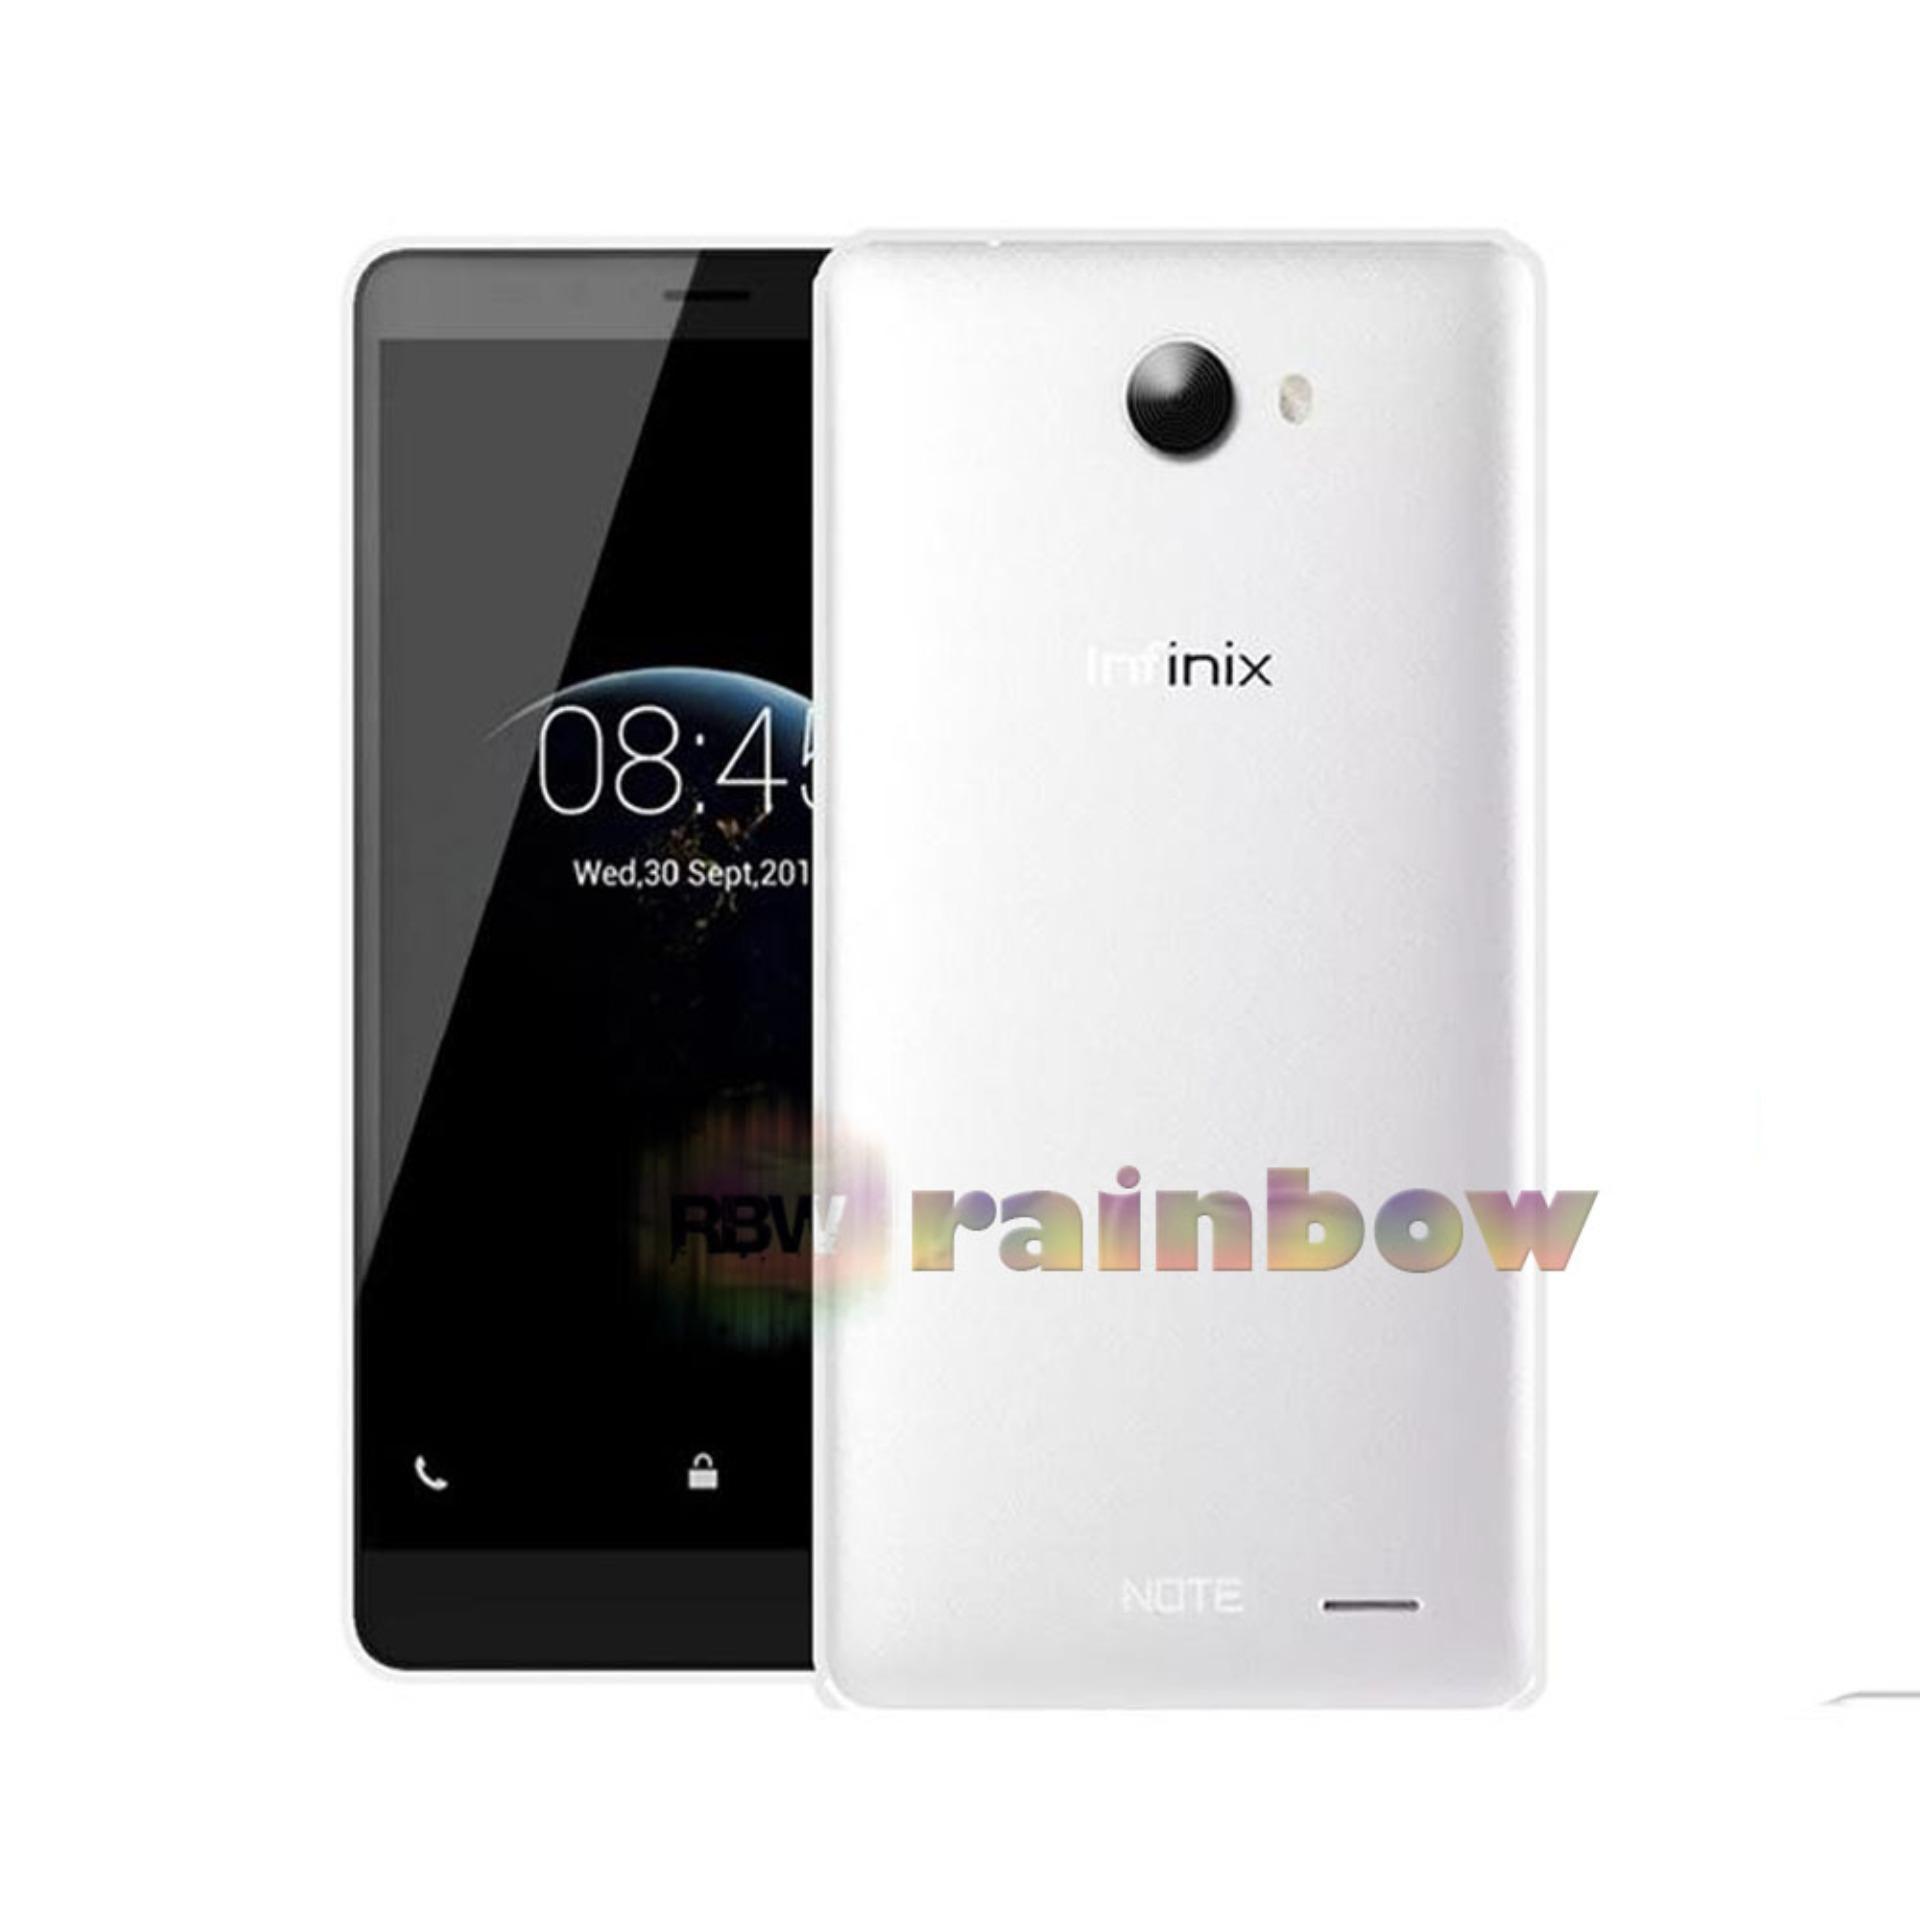 Rainbow Soft Case Infinix Note 2 X600 Clear / Silicon Case Infinix X600 / Ultrathin Infinix X600 / Silikon Infinix X600 / Jelly Case Infinix Note2 / Case Unik / Silicone Casing Infinix X600 - Transparan